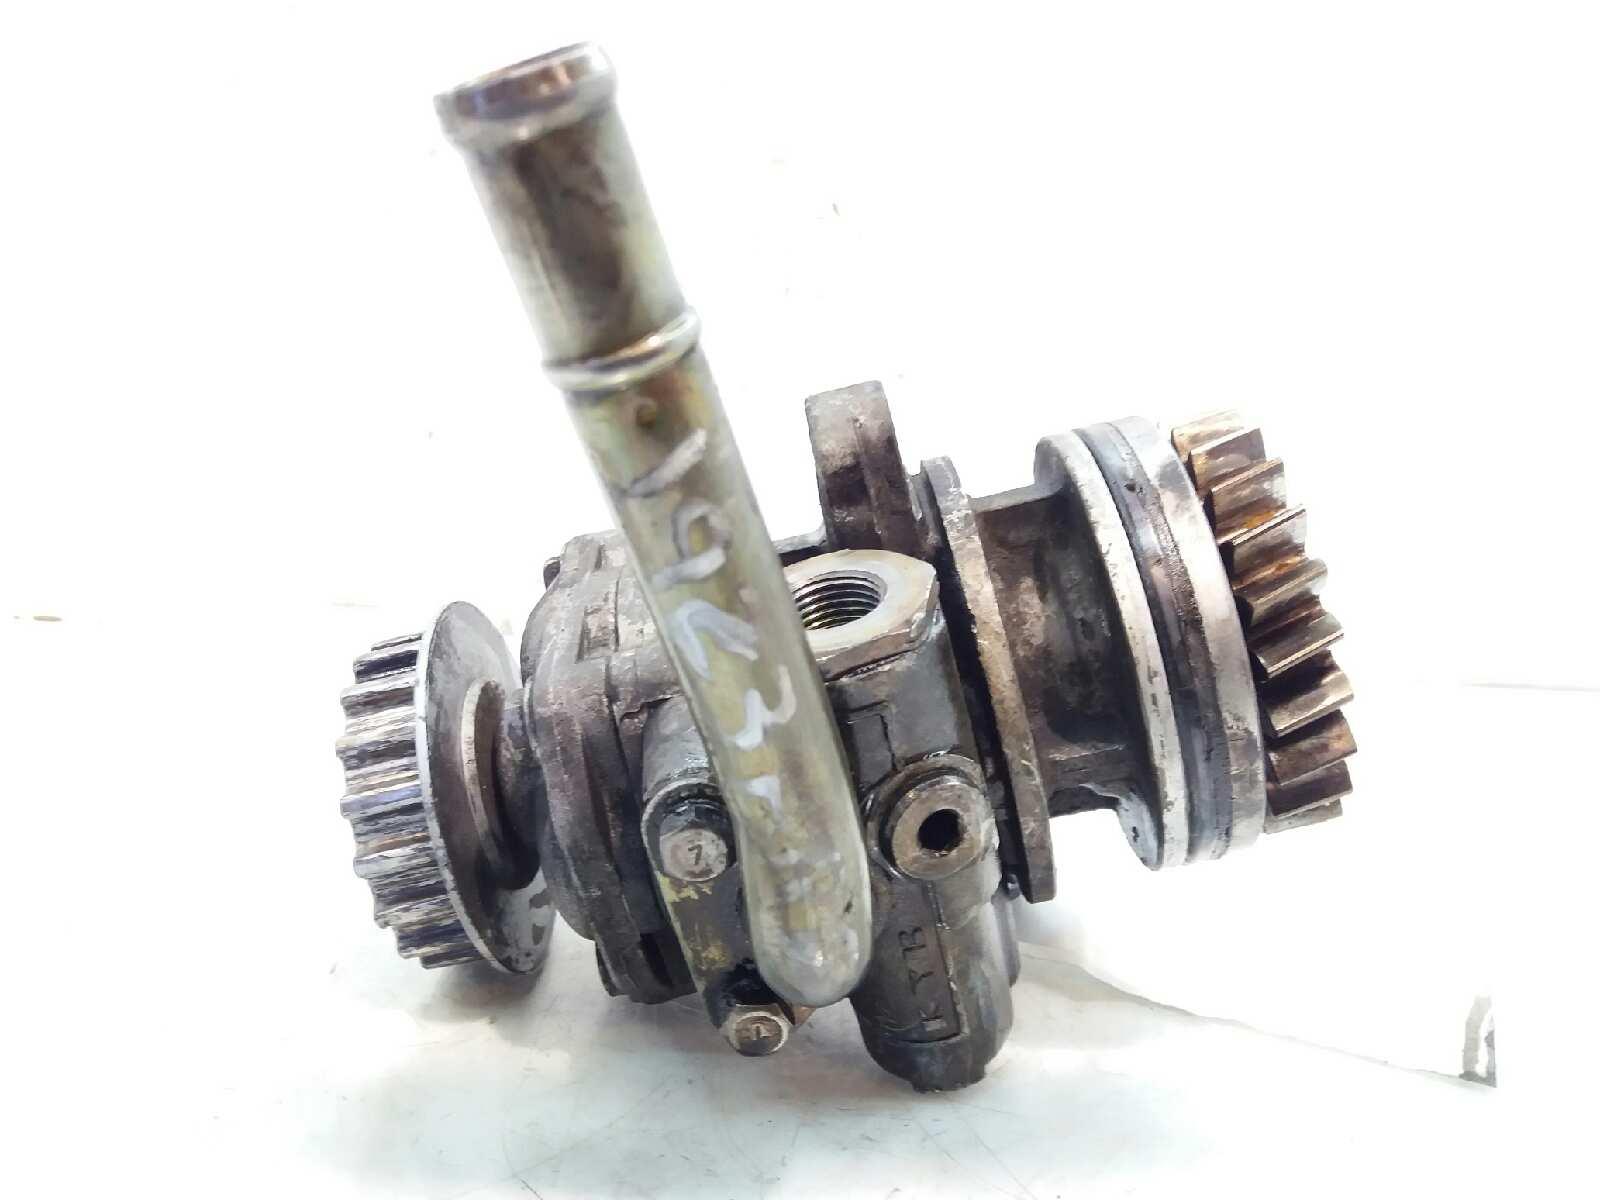 Pour VW TOUAREG 3.2 V6 FSi 3.0 V6 TDI 6.0 W12 2002-2010 Pompe de direction assistée